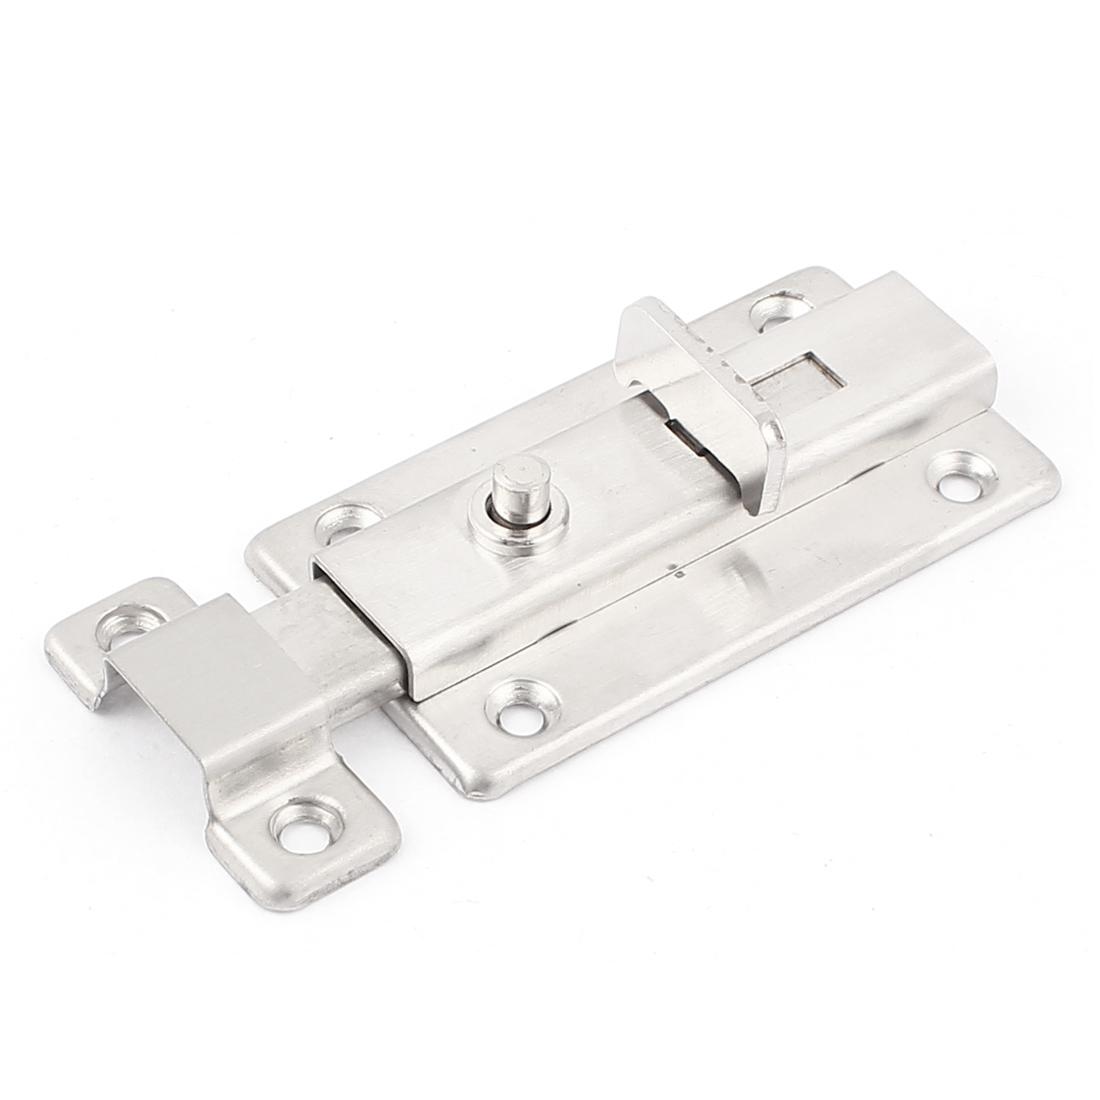 "3"" Long Home Cabinet Door Safety Slide Latch Lock Metal Barrel Bolt Silver Tone"